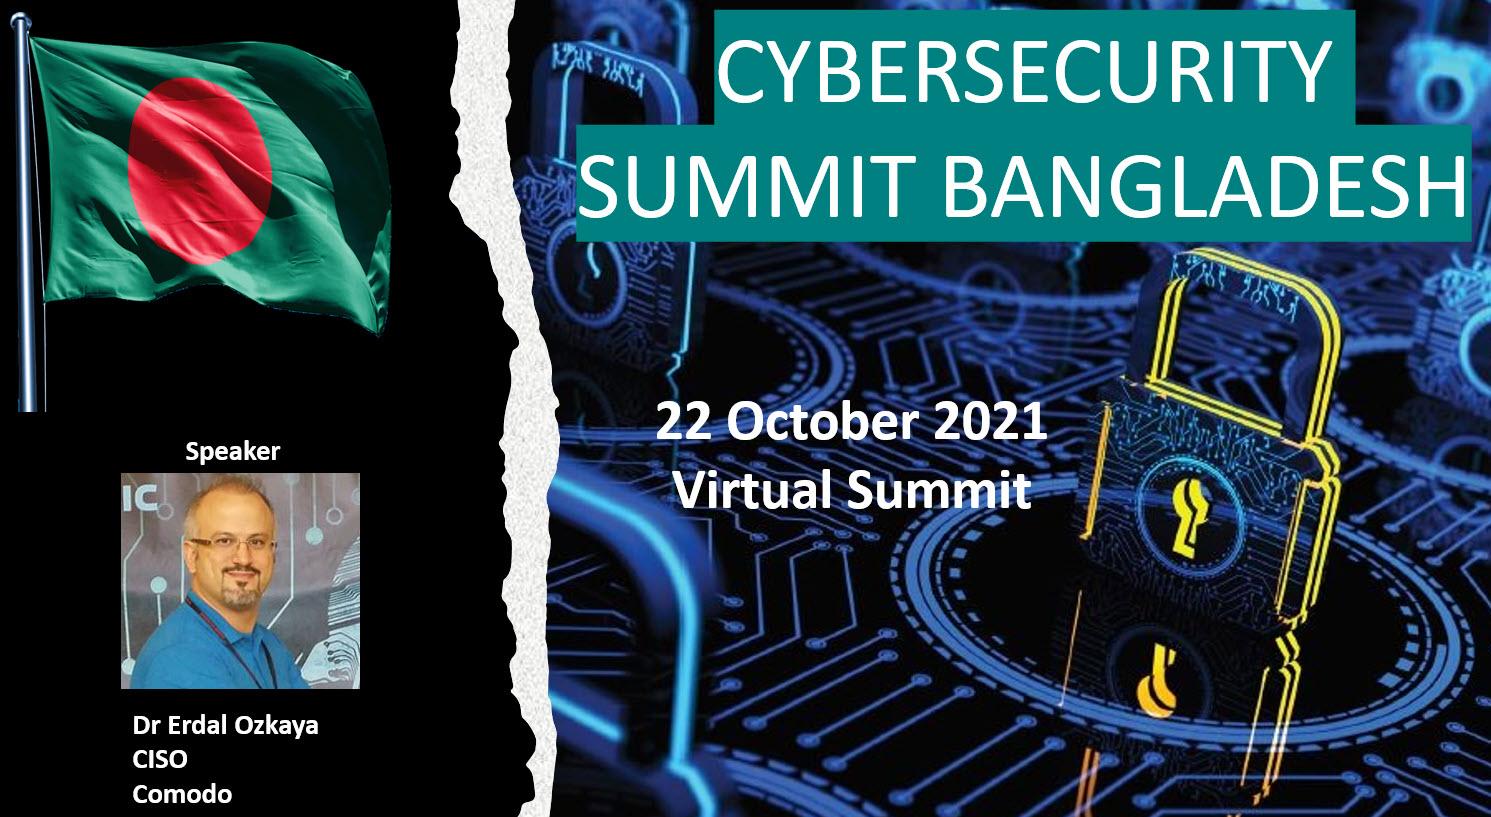 CYBERSECURITY SUMMIT BANGLADESH -2021 - Free to join   Dr. Erdal Ozkaya - Cybersecurity Blog